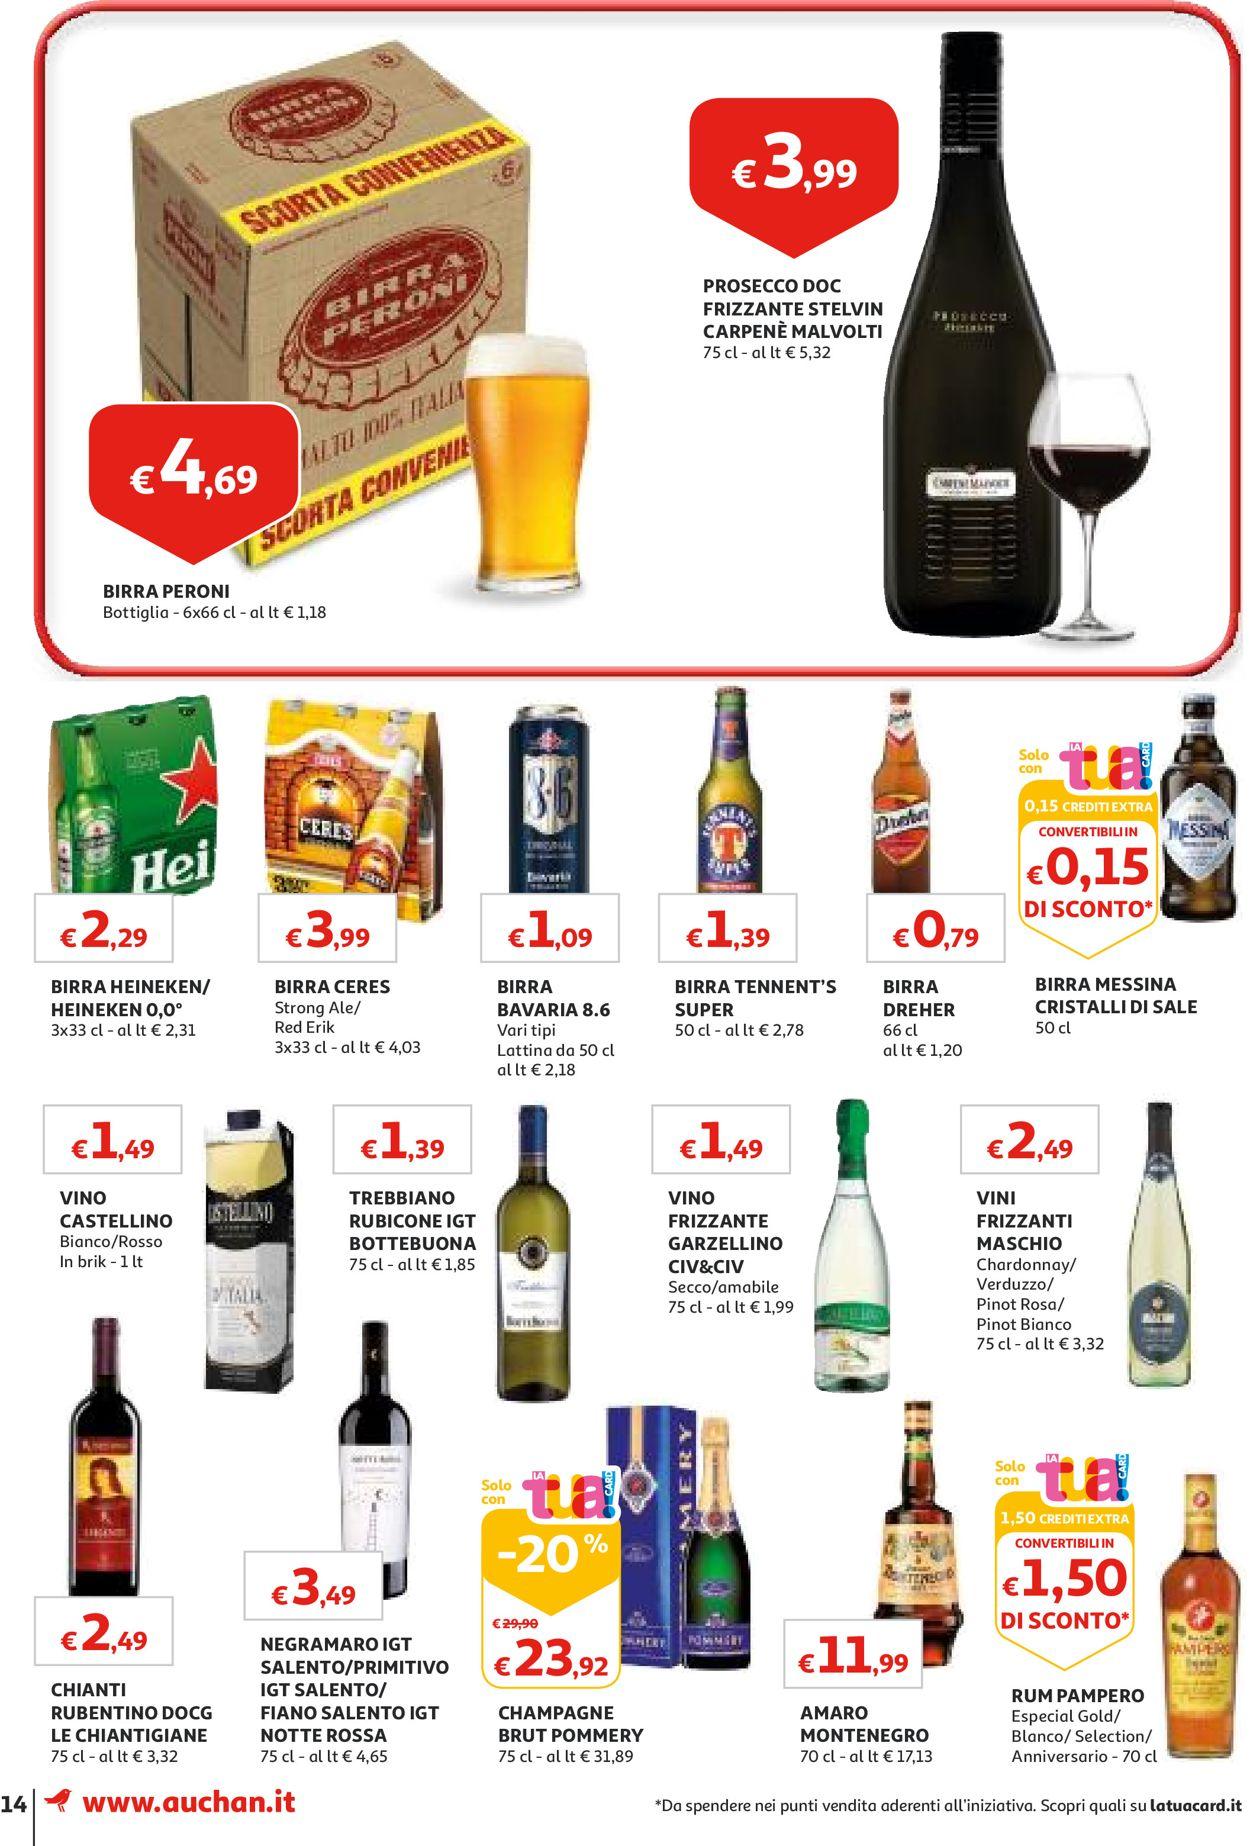 Volantino Auchan - Offerte 20/08-28/08/2019 (Pagina 14)